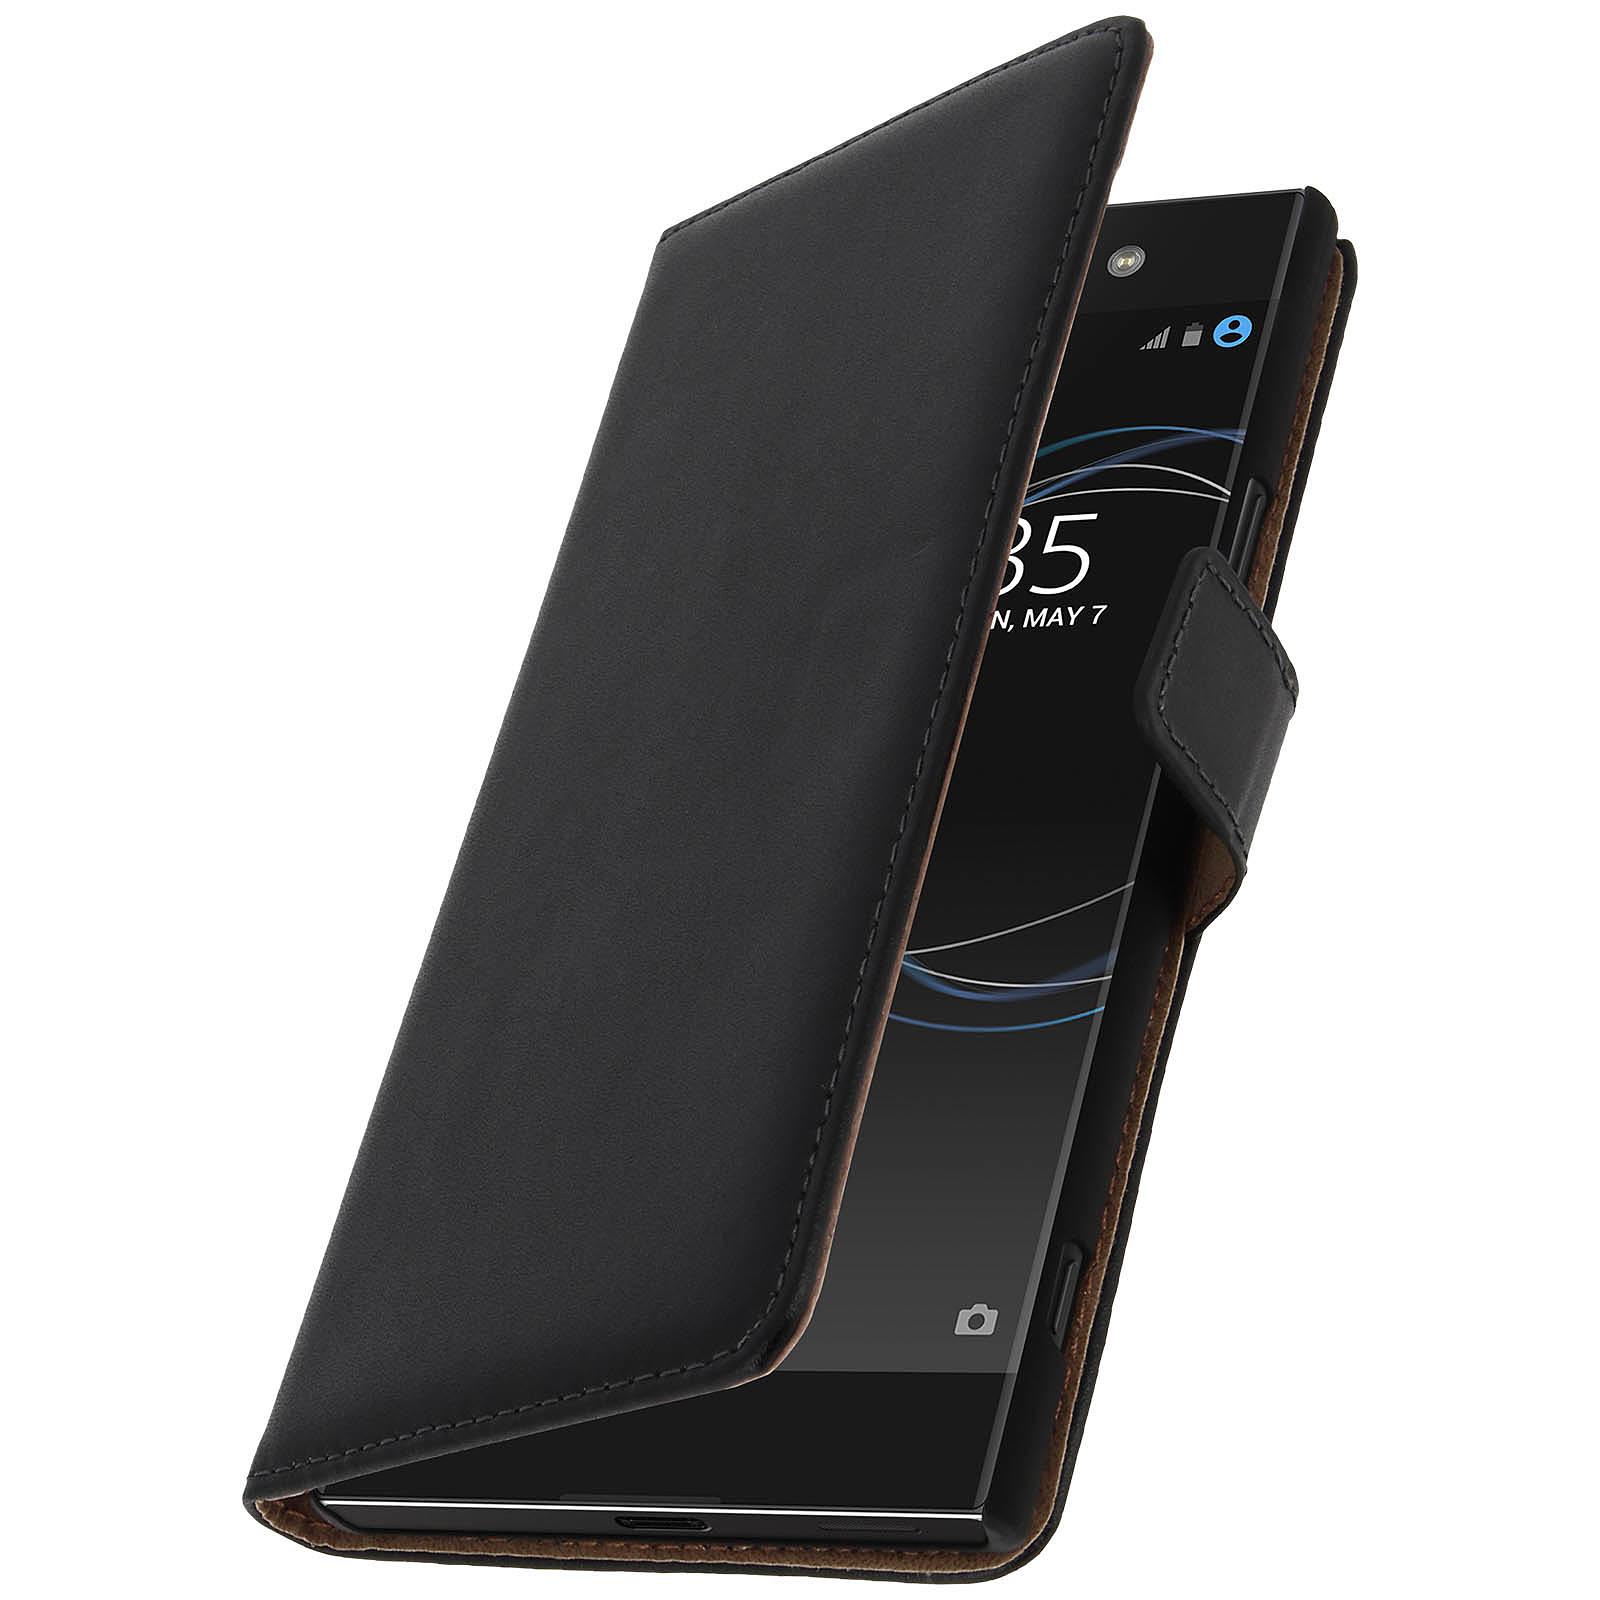 Avizar Etui folio Noir pour Sony Xperia XA1 Ultra